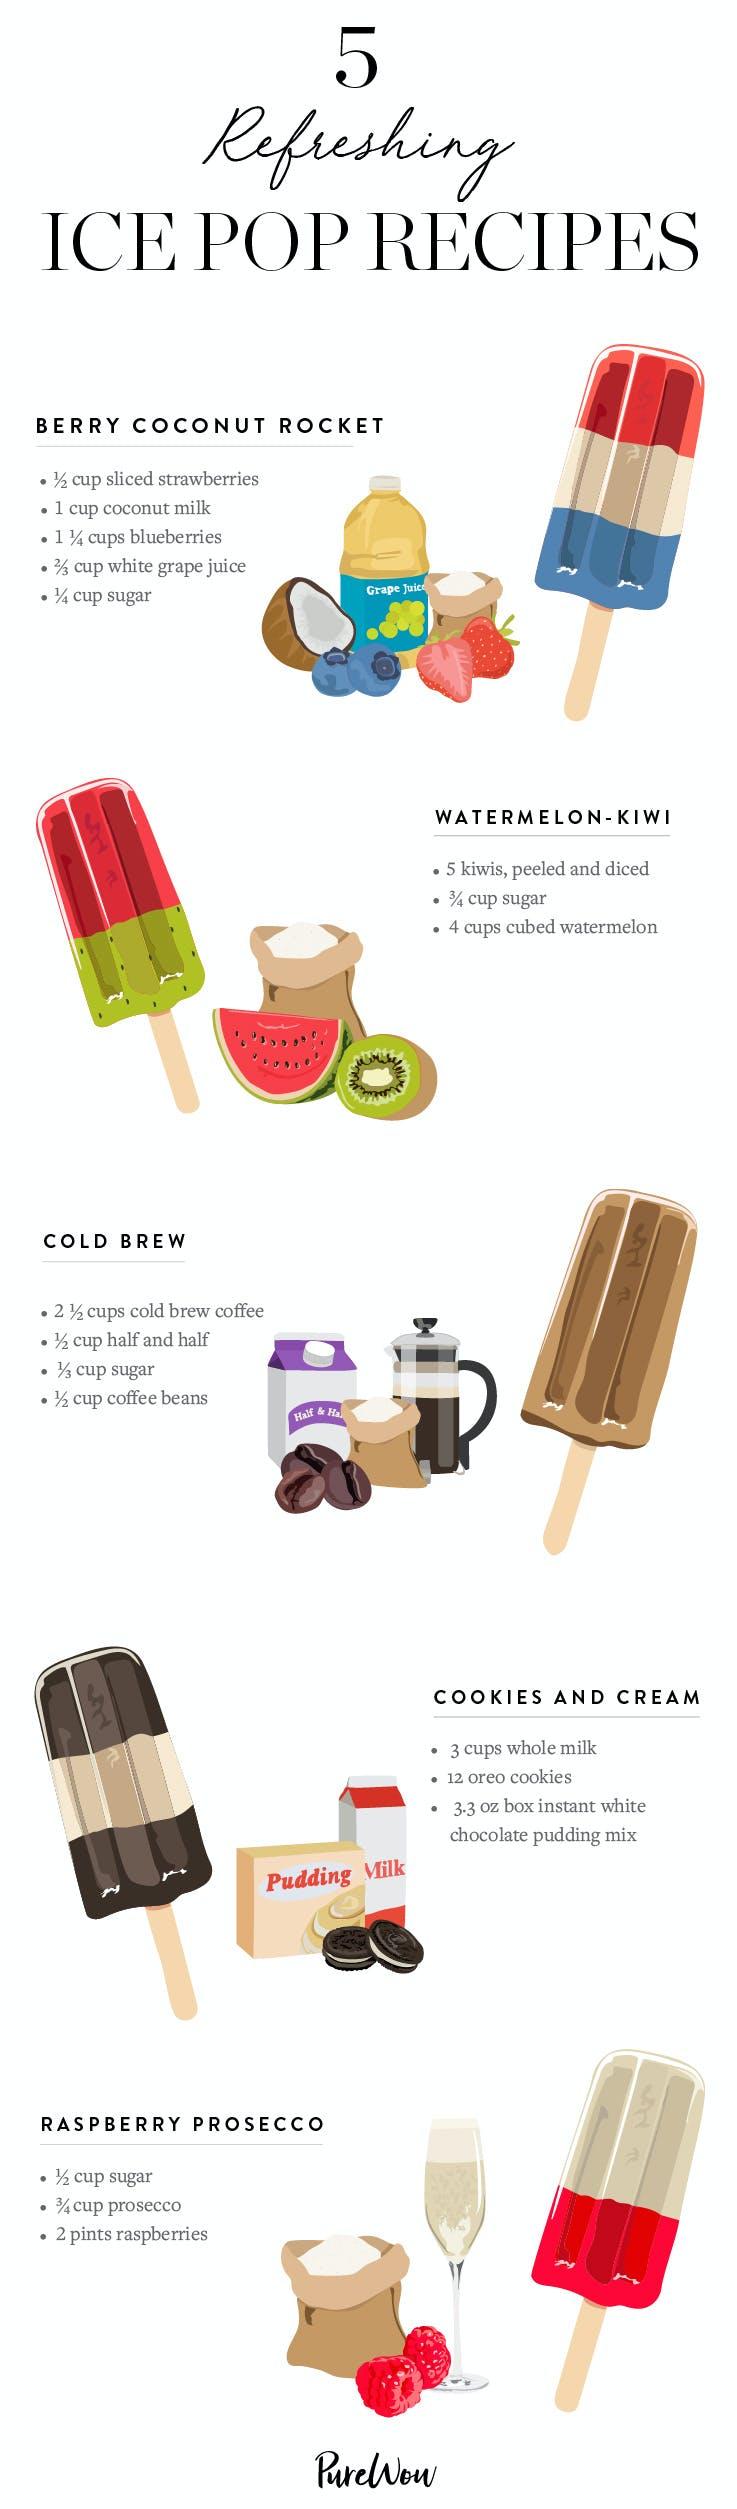 homemade ice pops recipe infographic